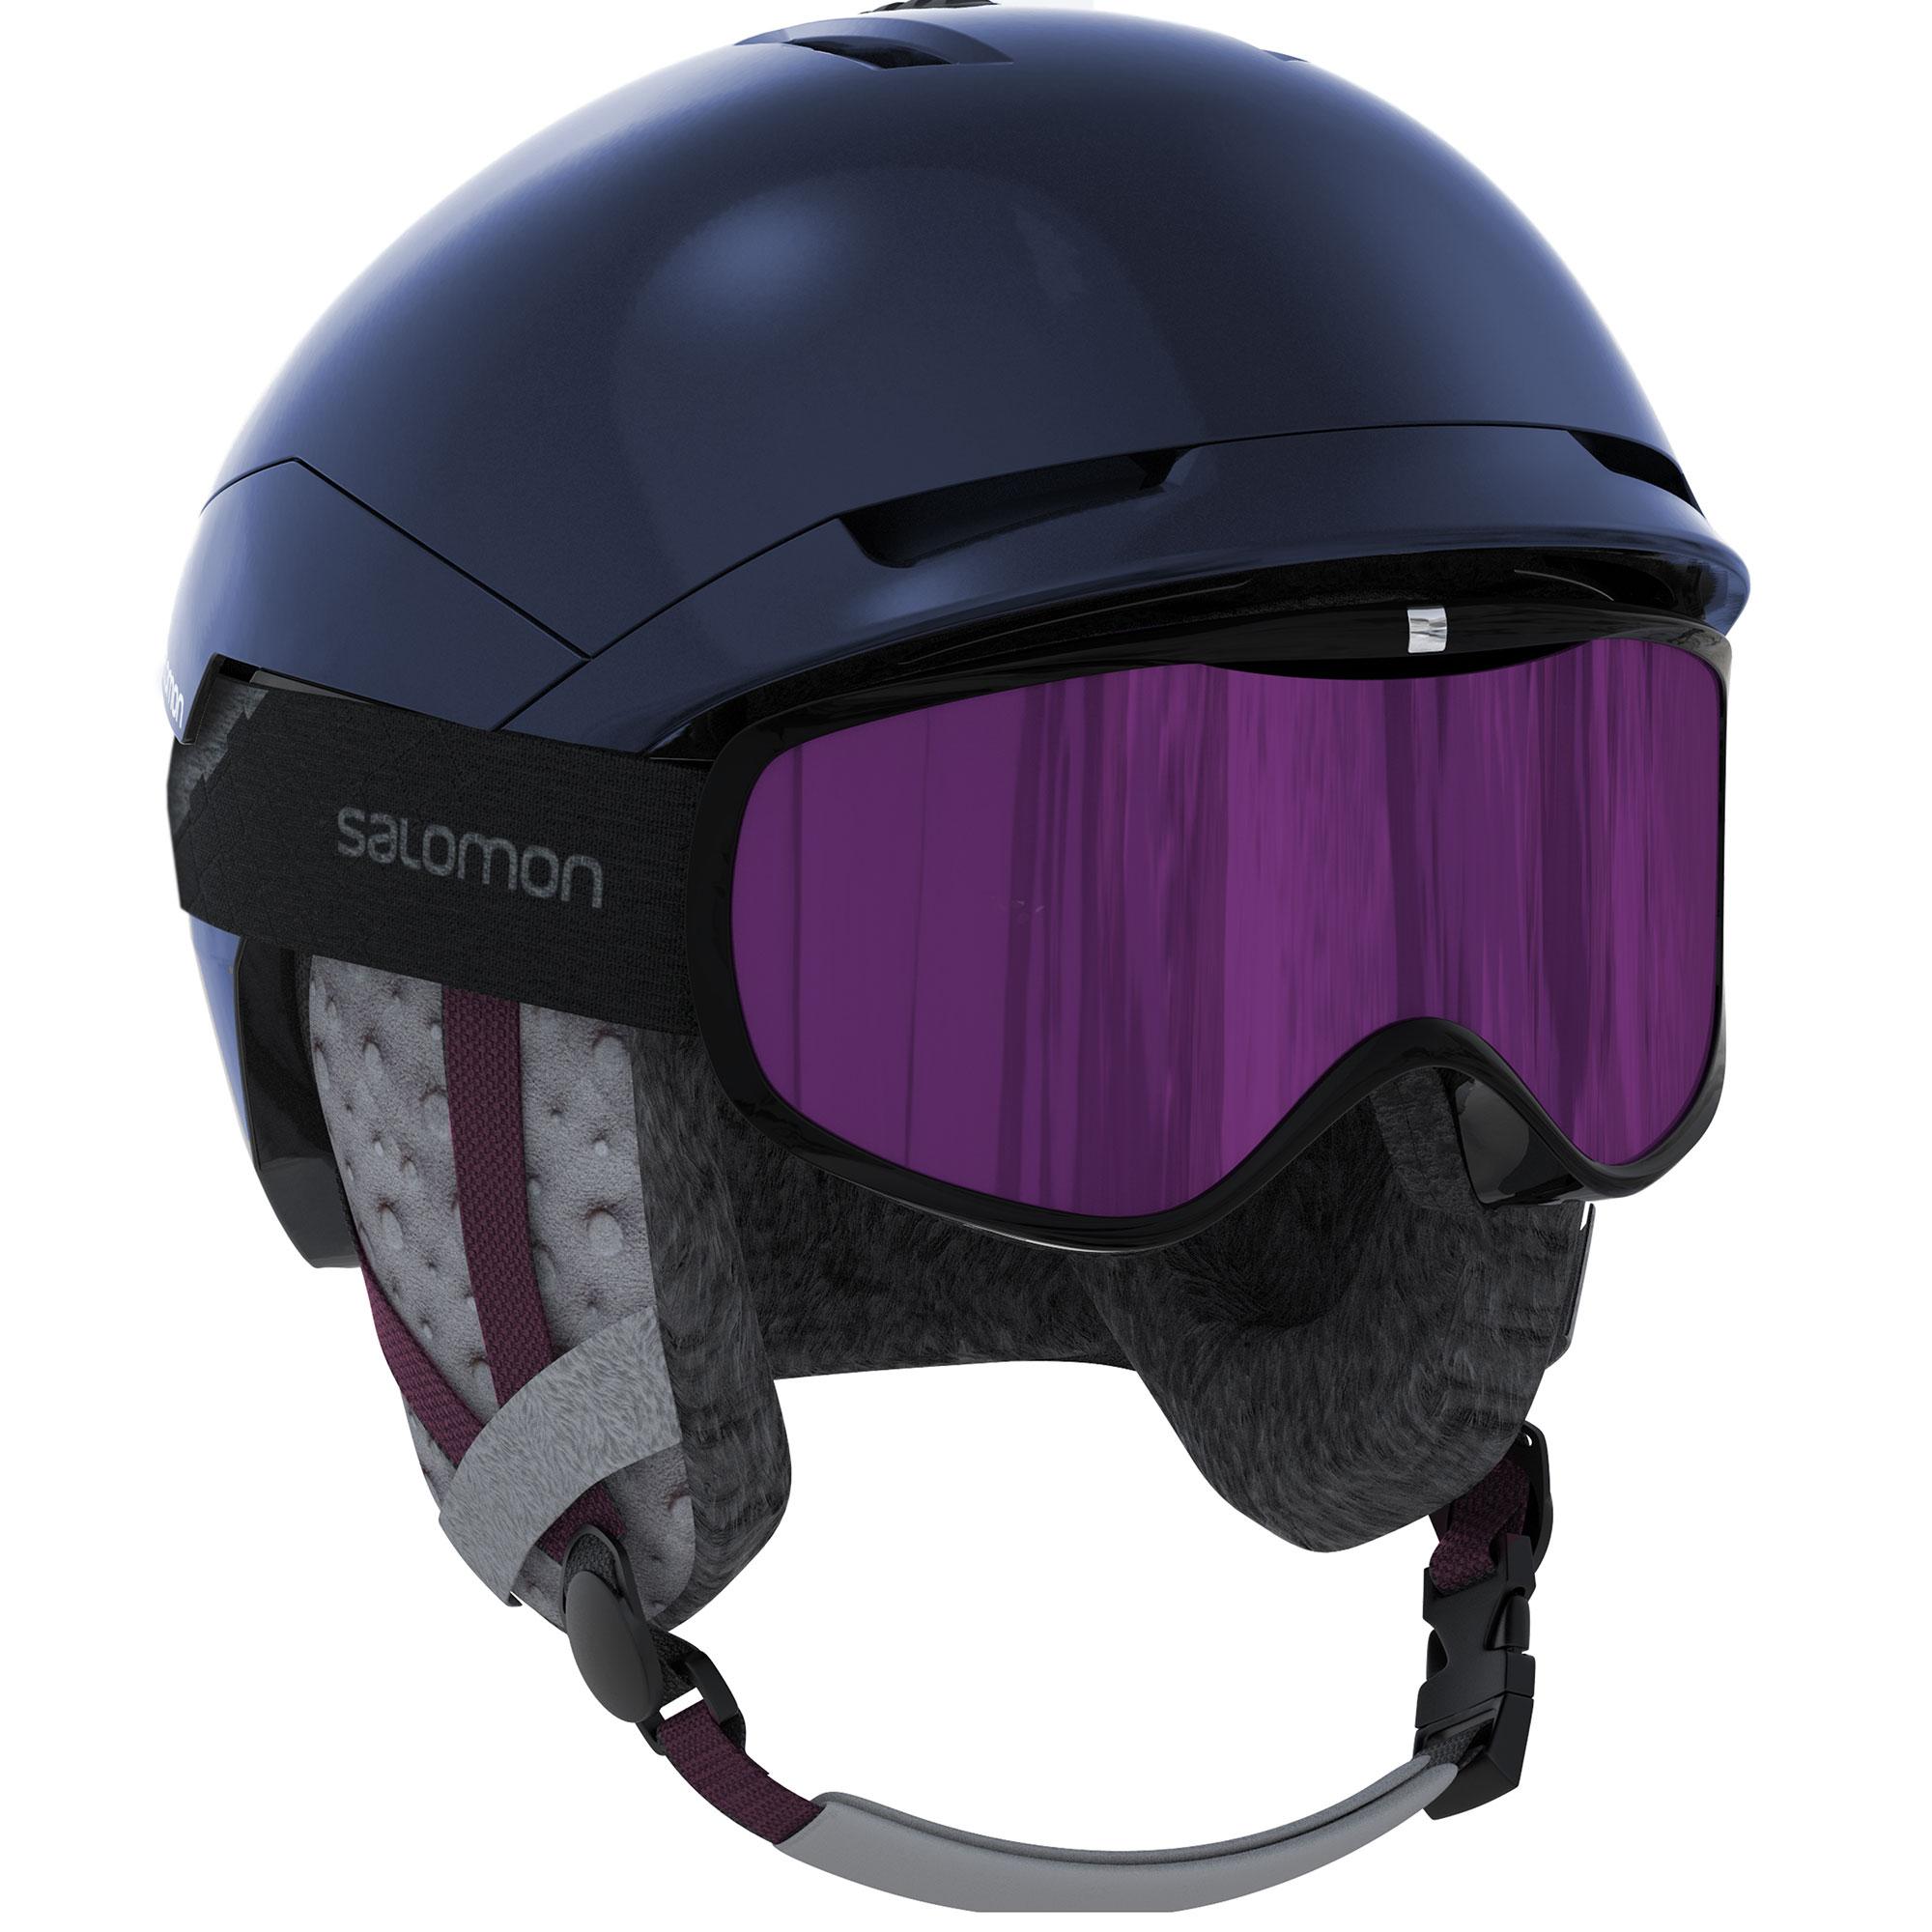 Details about Salomon Quest Access Womens Ski or Snowboard Helmet Size Medium, Wisteria Navy